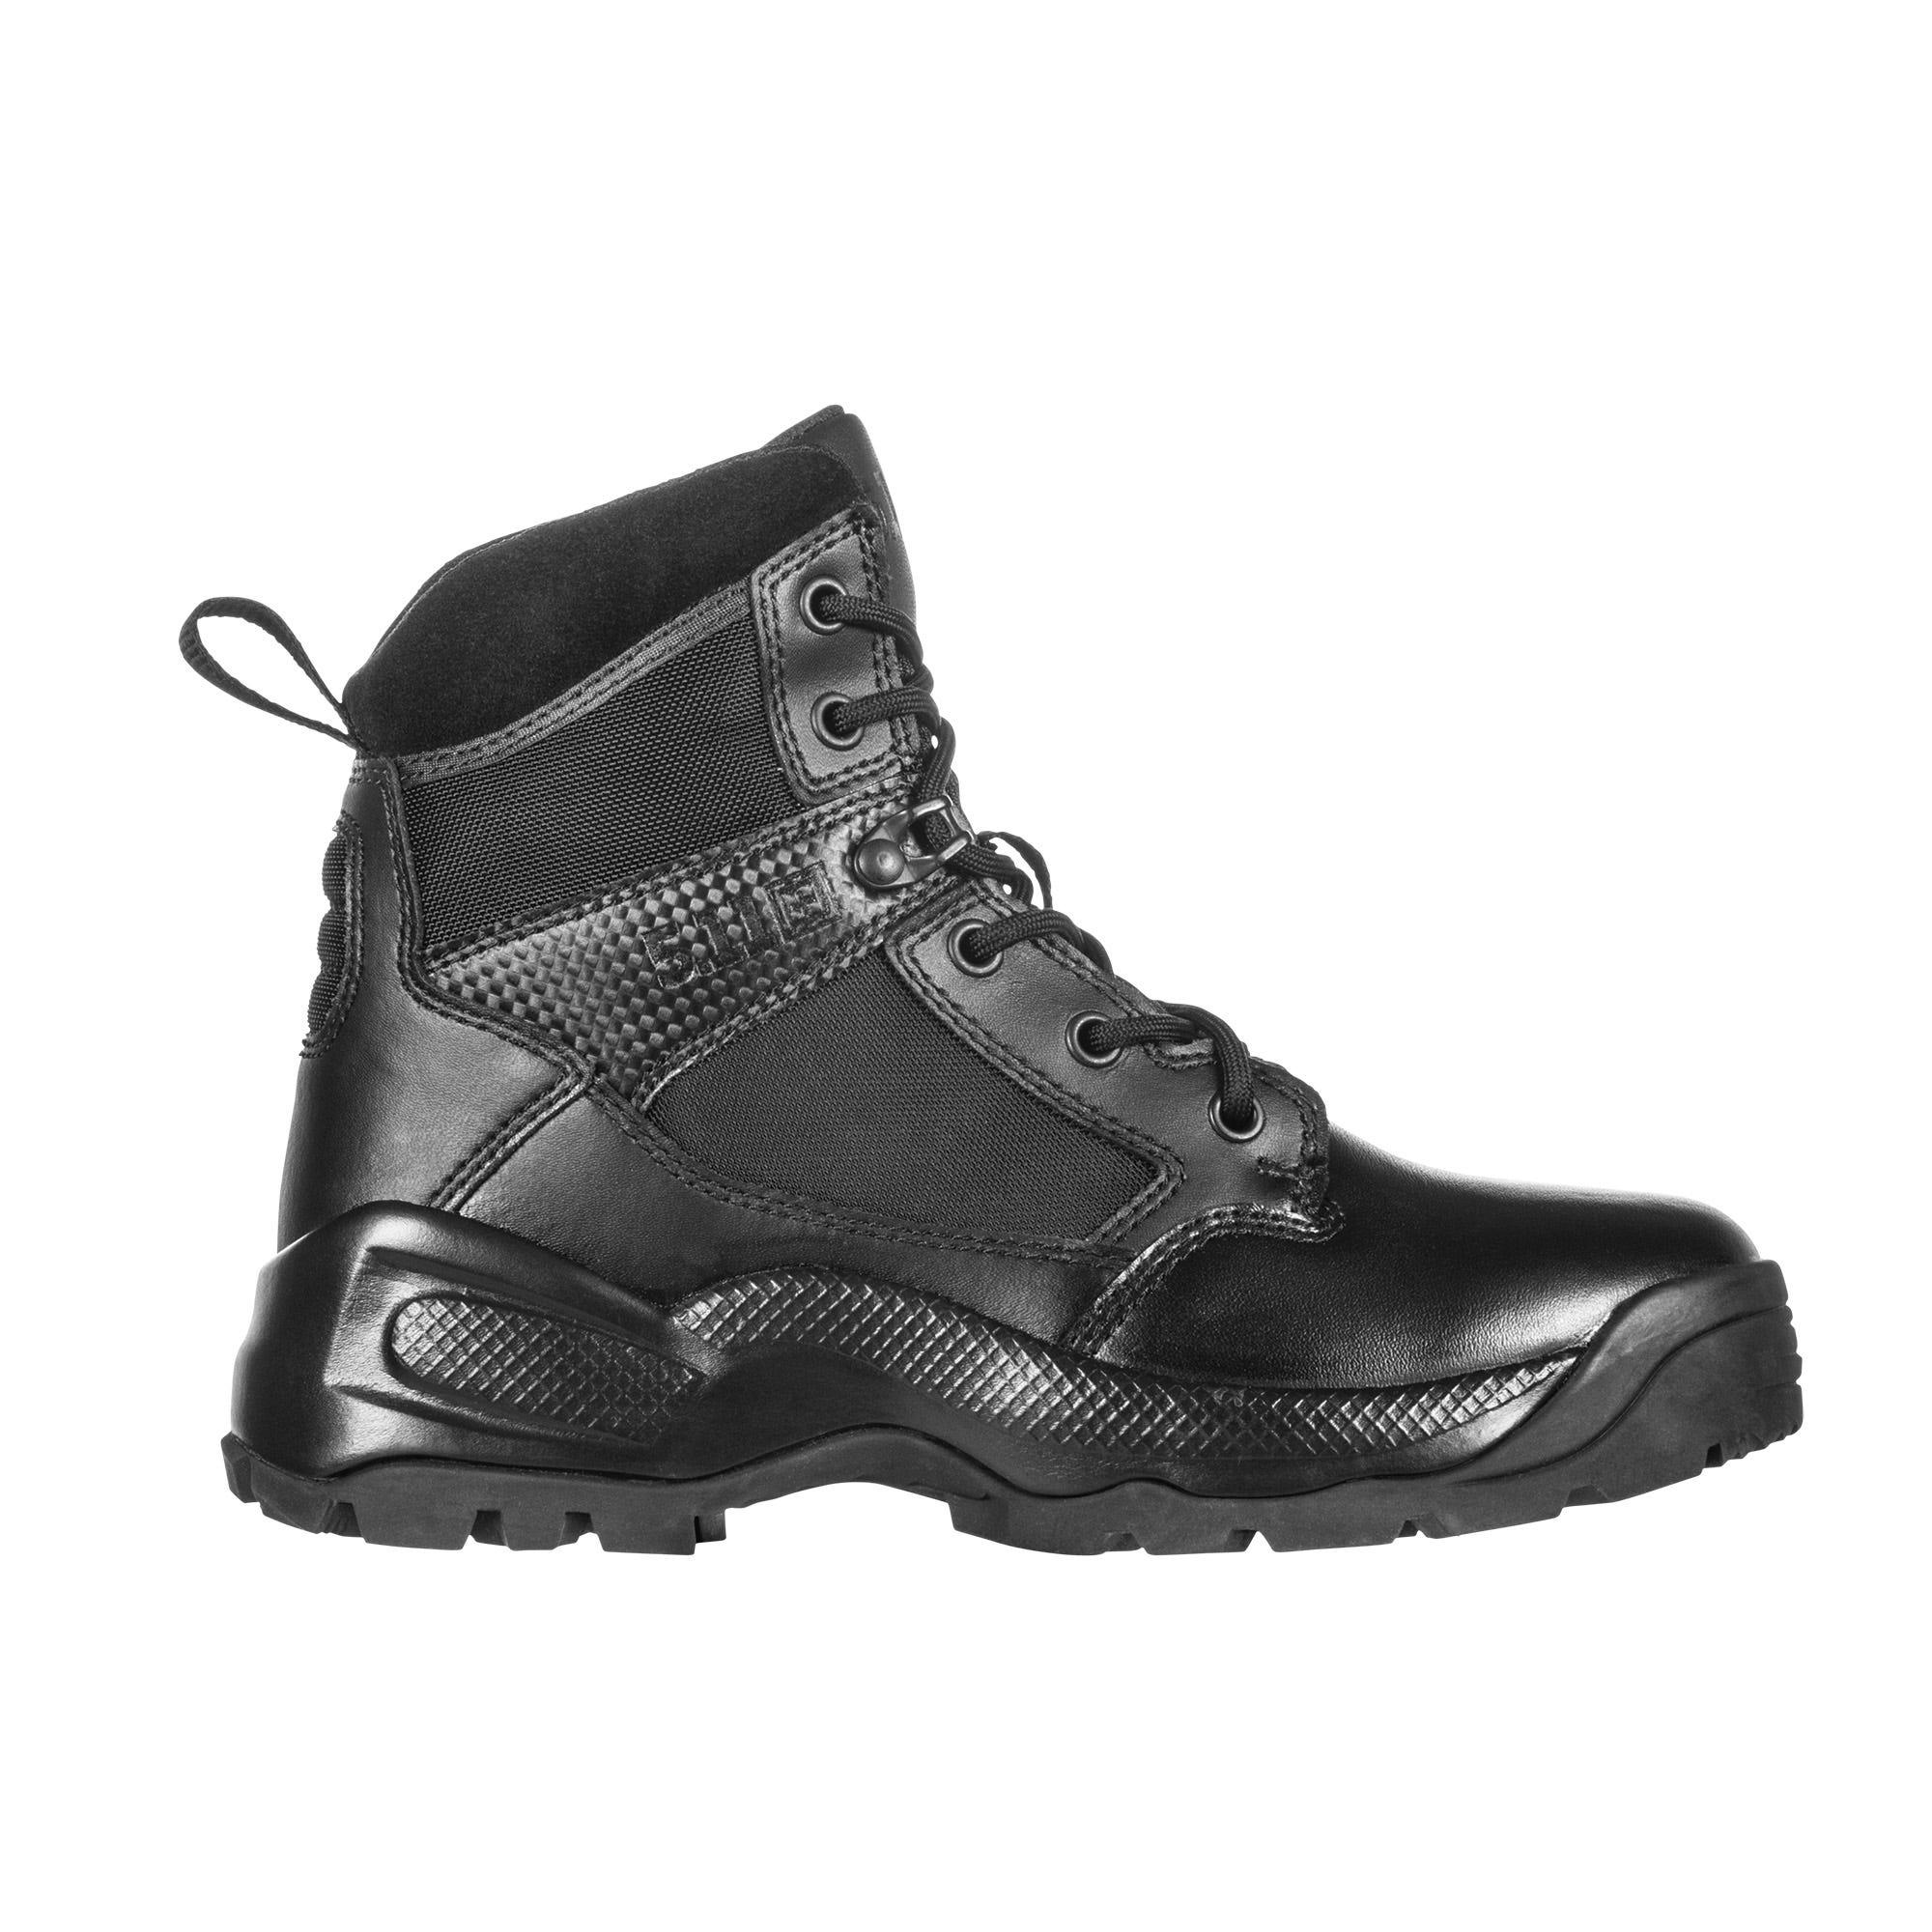 5.11 Tactical Women's Womens ATAC 2.0 6 Boot thumbnail